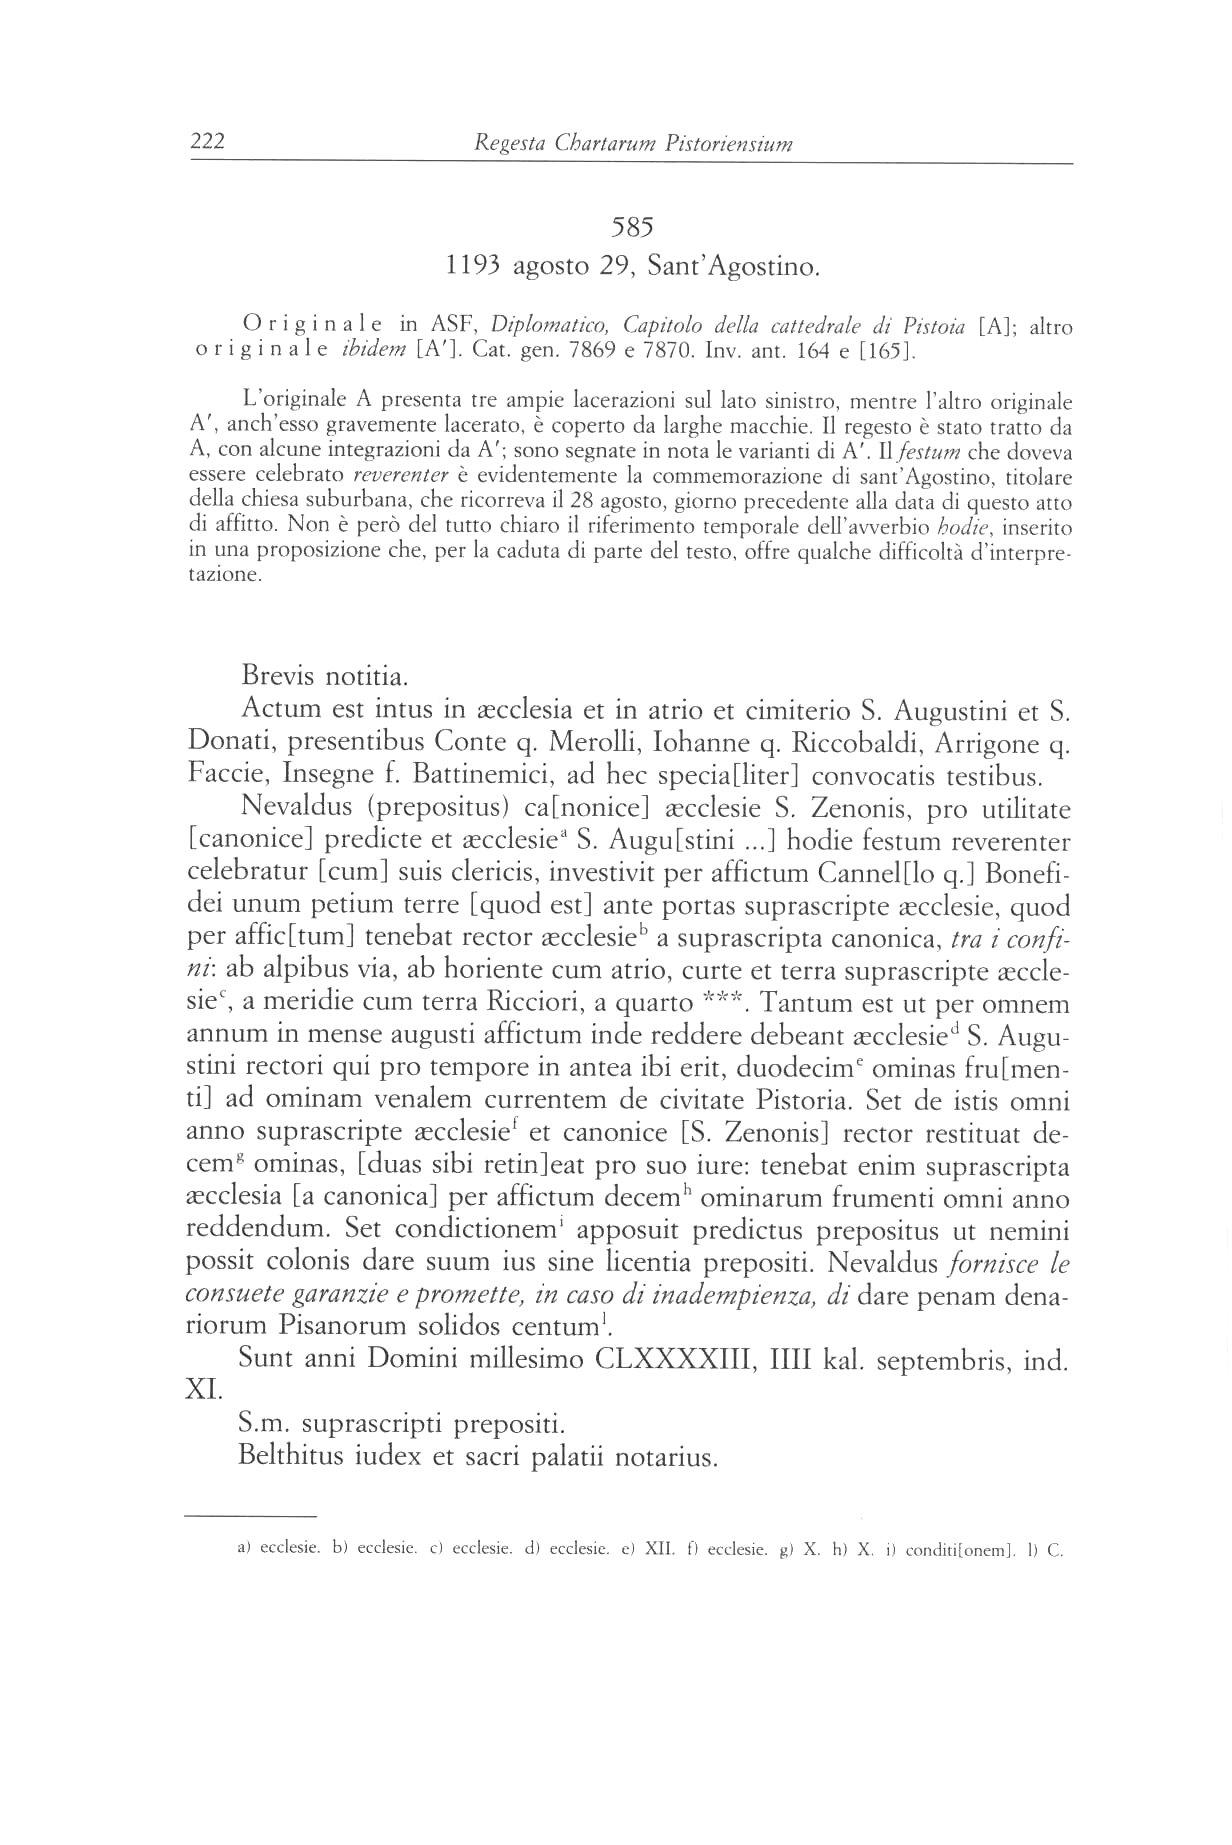 Canonica S. Zenone XII 0222.jpg